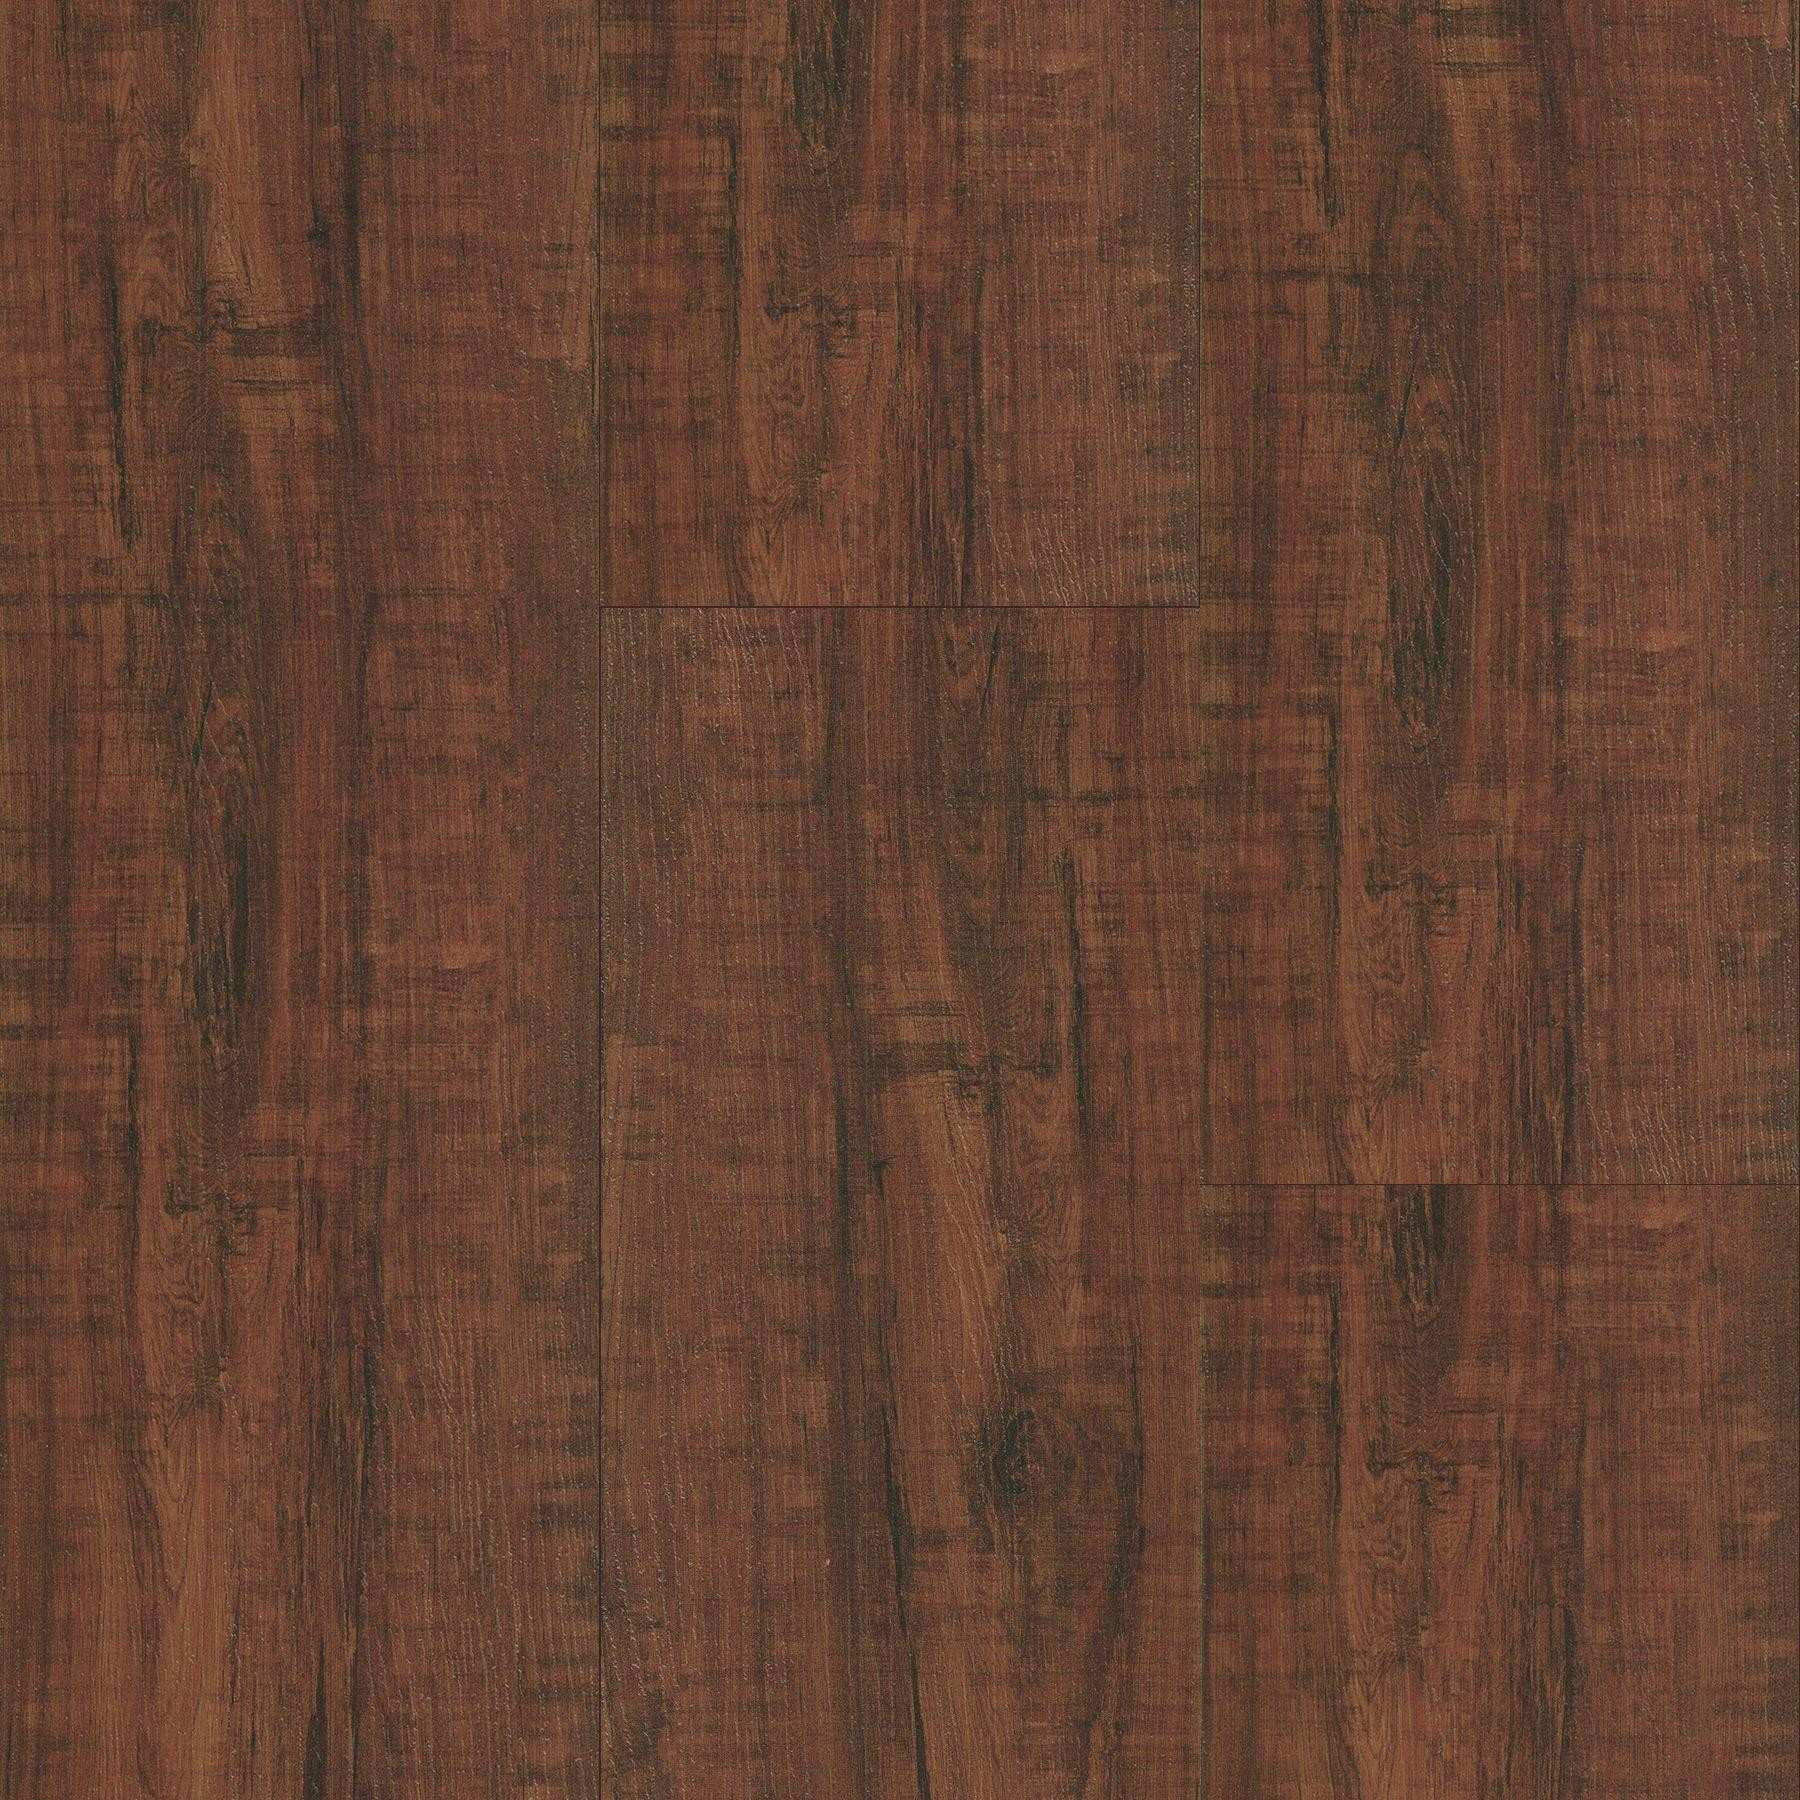 hardwood floor underlayment home depot of laminate hardwood flooring cost lovely 8mm laminate flooring regarding laminate hardwood flooring cost lovely 8mm laminate flooring of laminate hardwood flooring cost lovely 8mm laminate